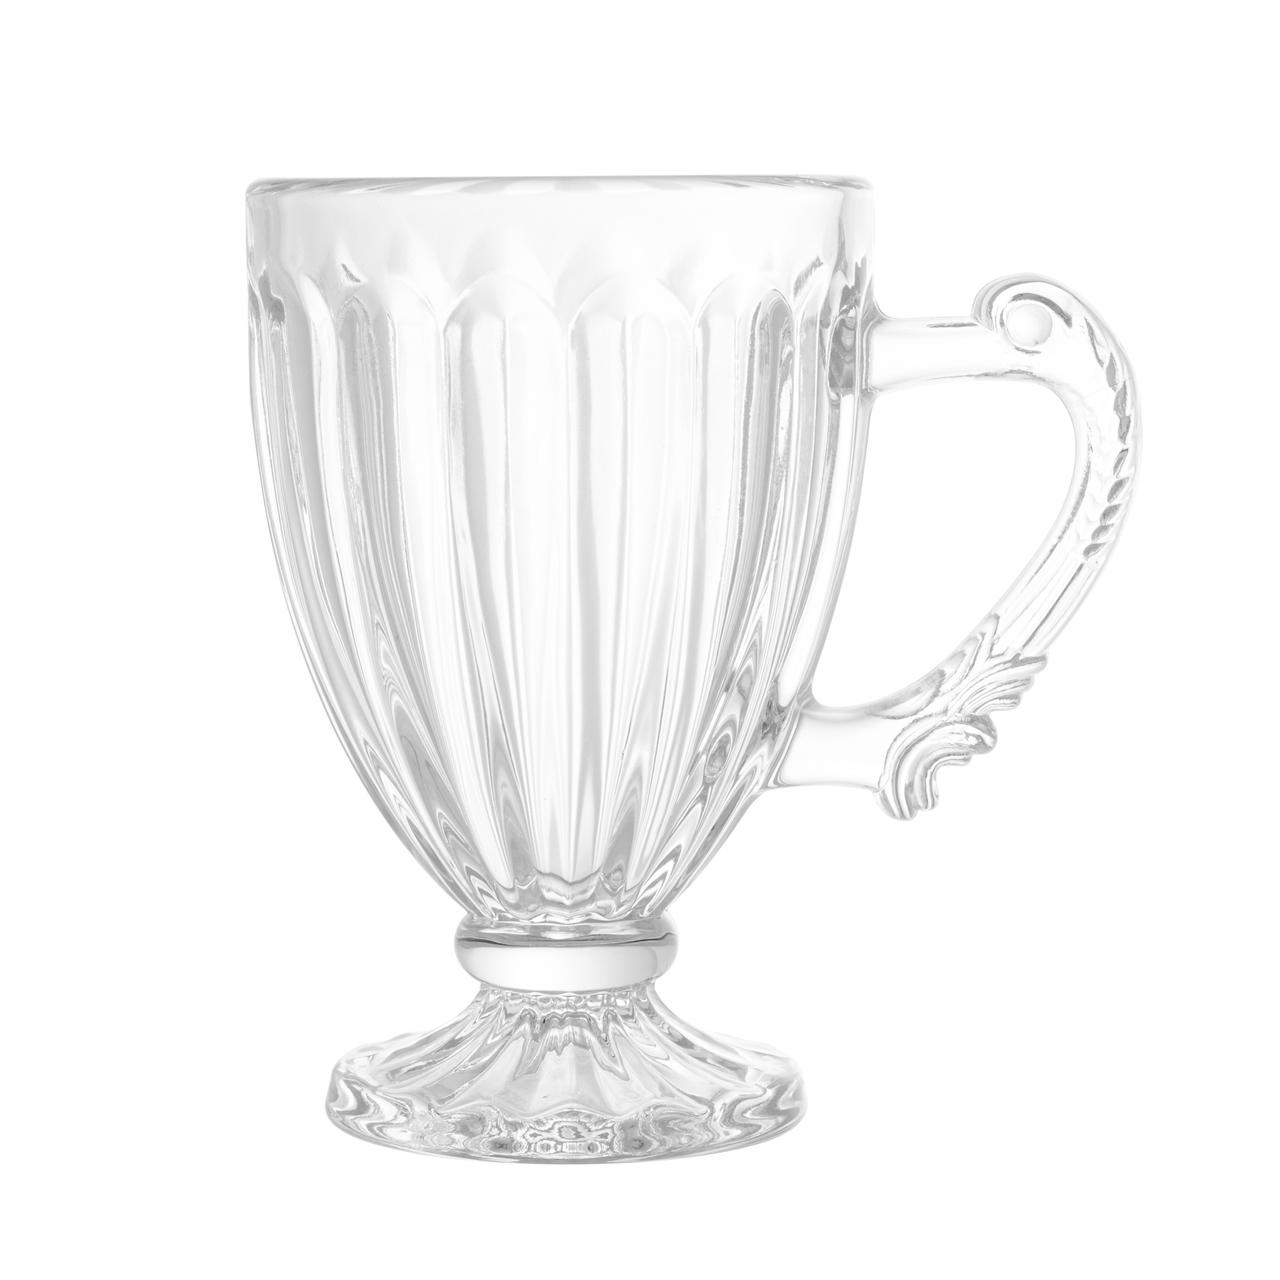 Xícara para café em cristal Renaissance Lyor